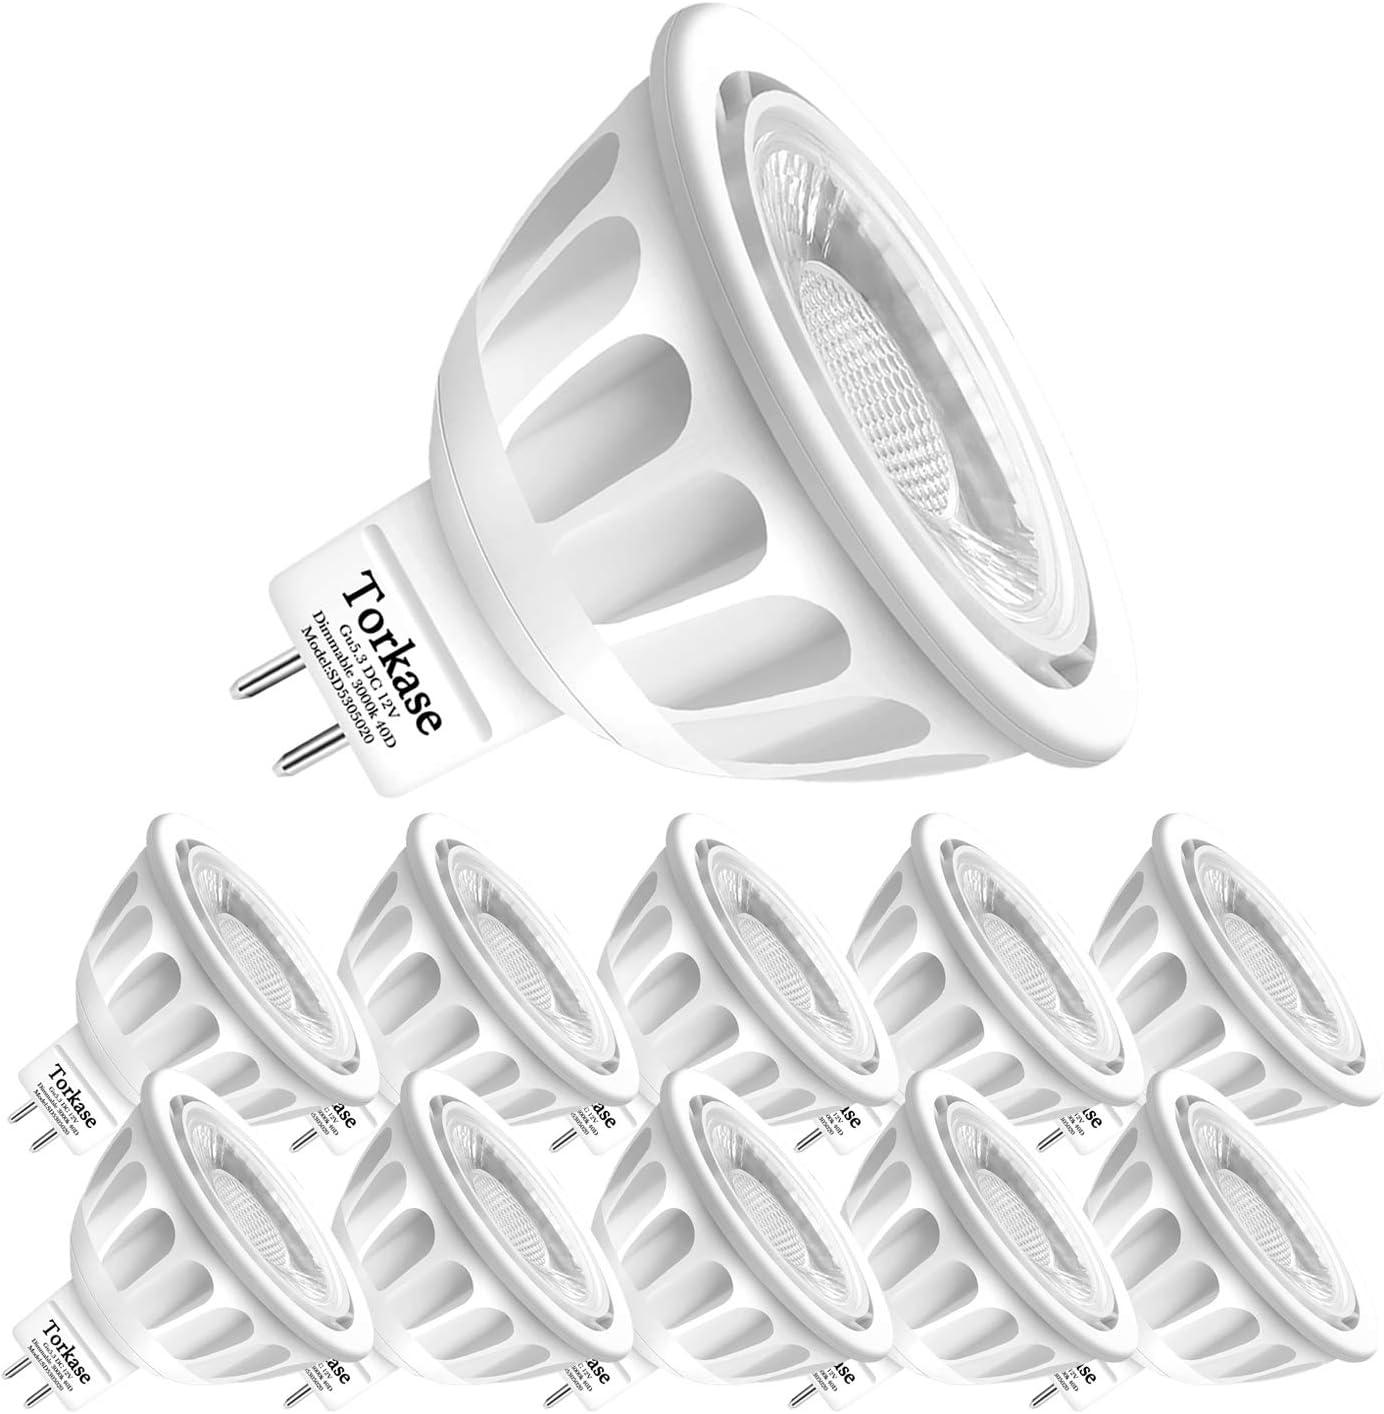 10 Pack Dimmable MR16 LED Bulbs, 5-Watt (50-Watt Equivalent), 3000-Kelvin Warm White, GU5.3 Bi-Pin Base, 40-Degree, DC 12-Volt Indoor/Outdoor Landscape Spot Lighting Bulbs by Torkase